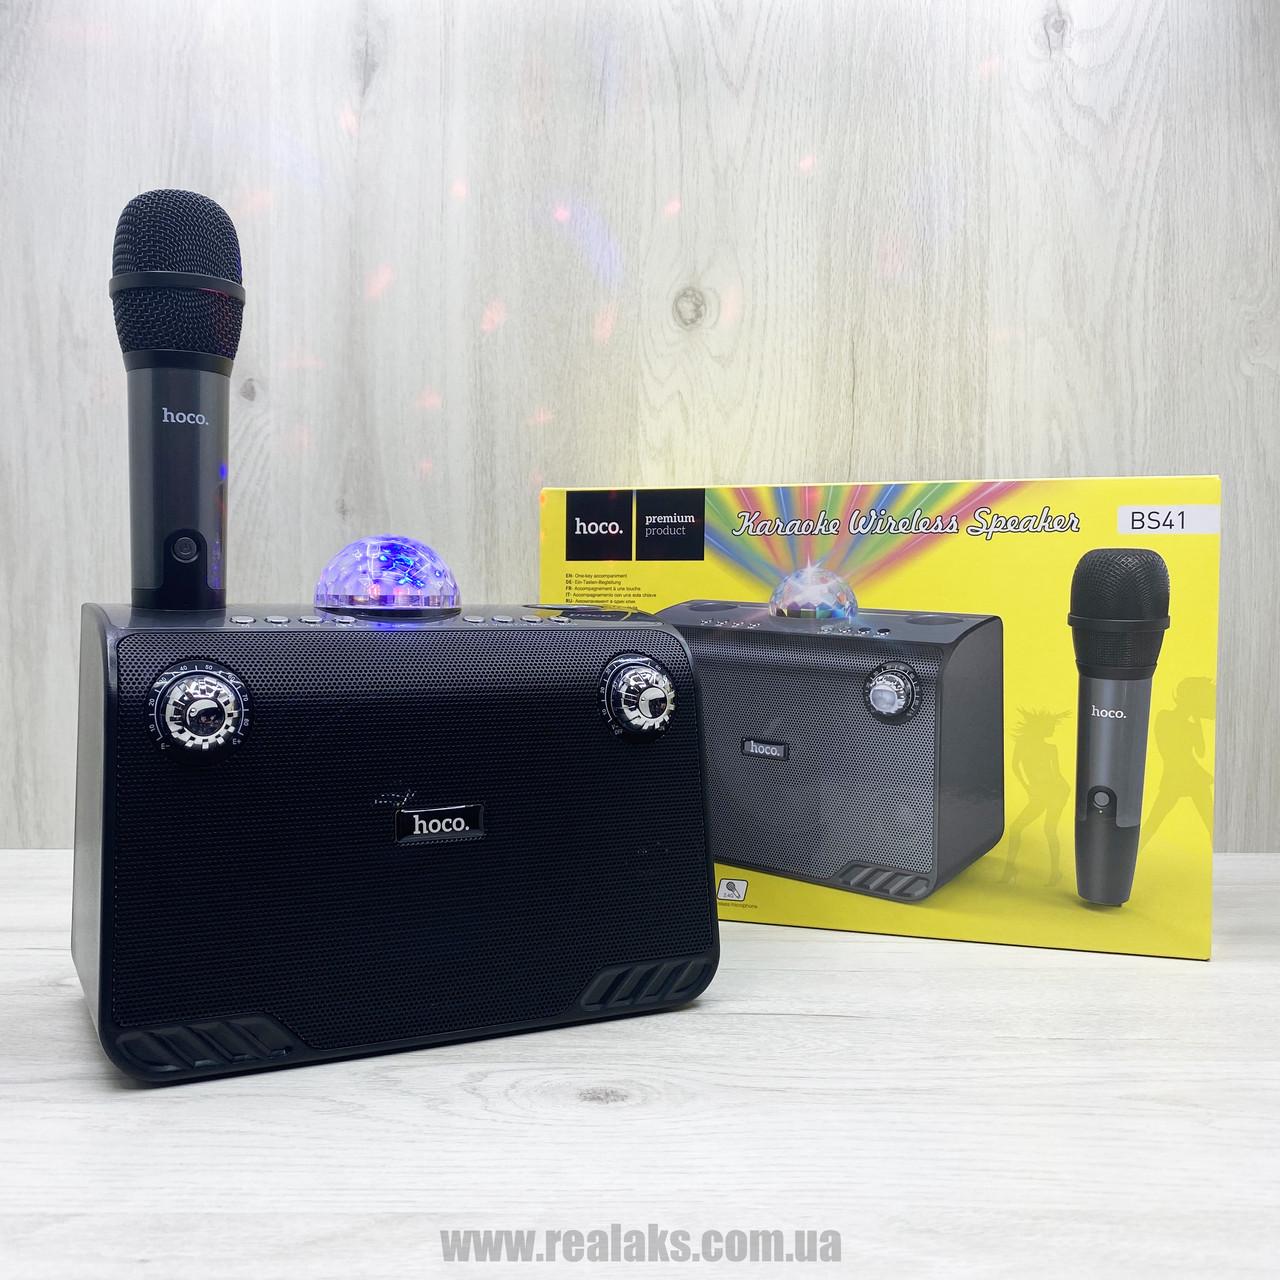 Портативная караоке система Hoco BS41 (Black)